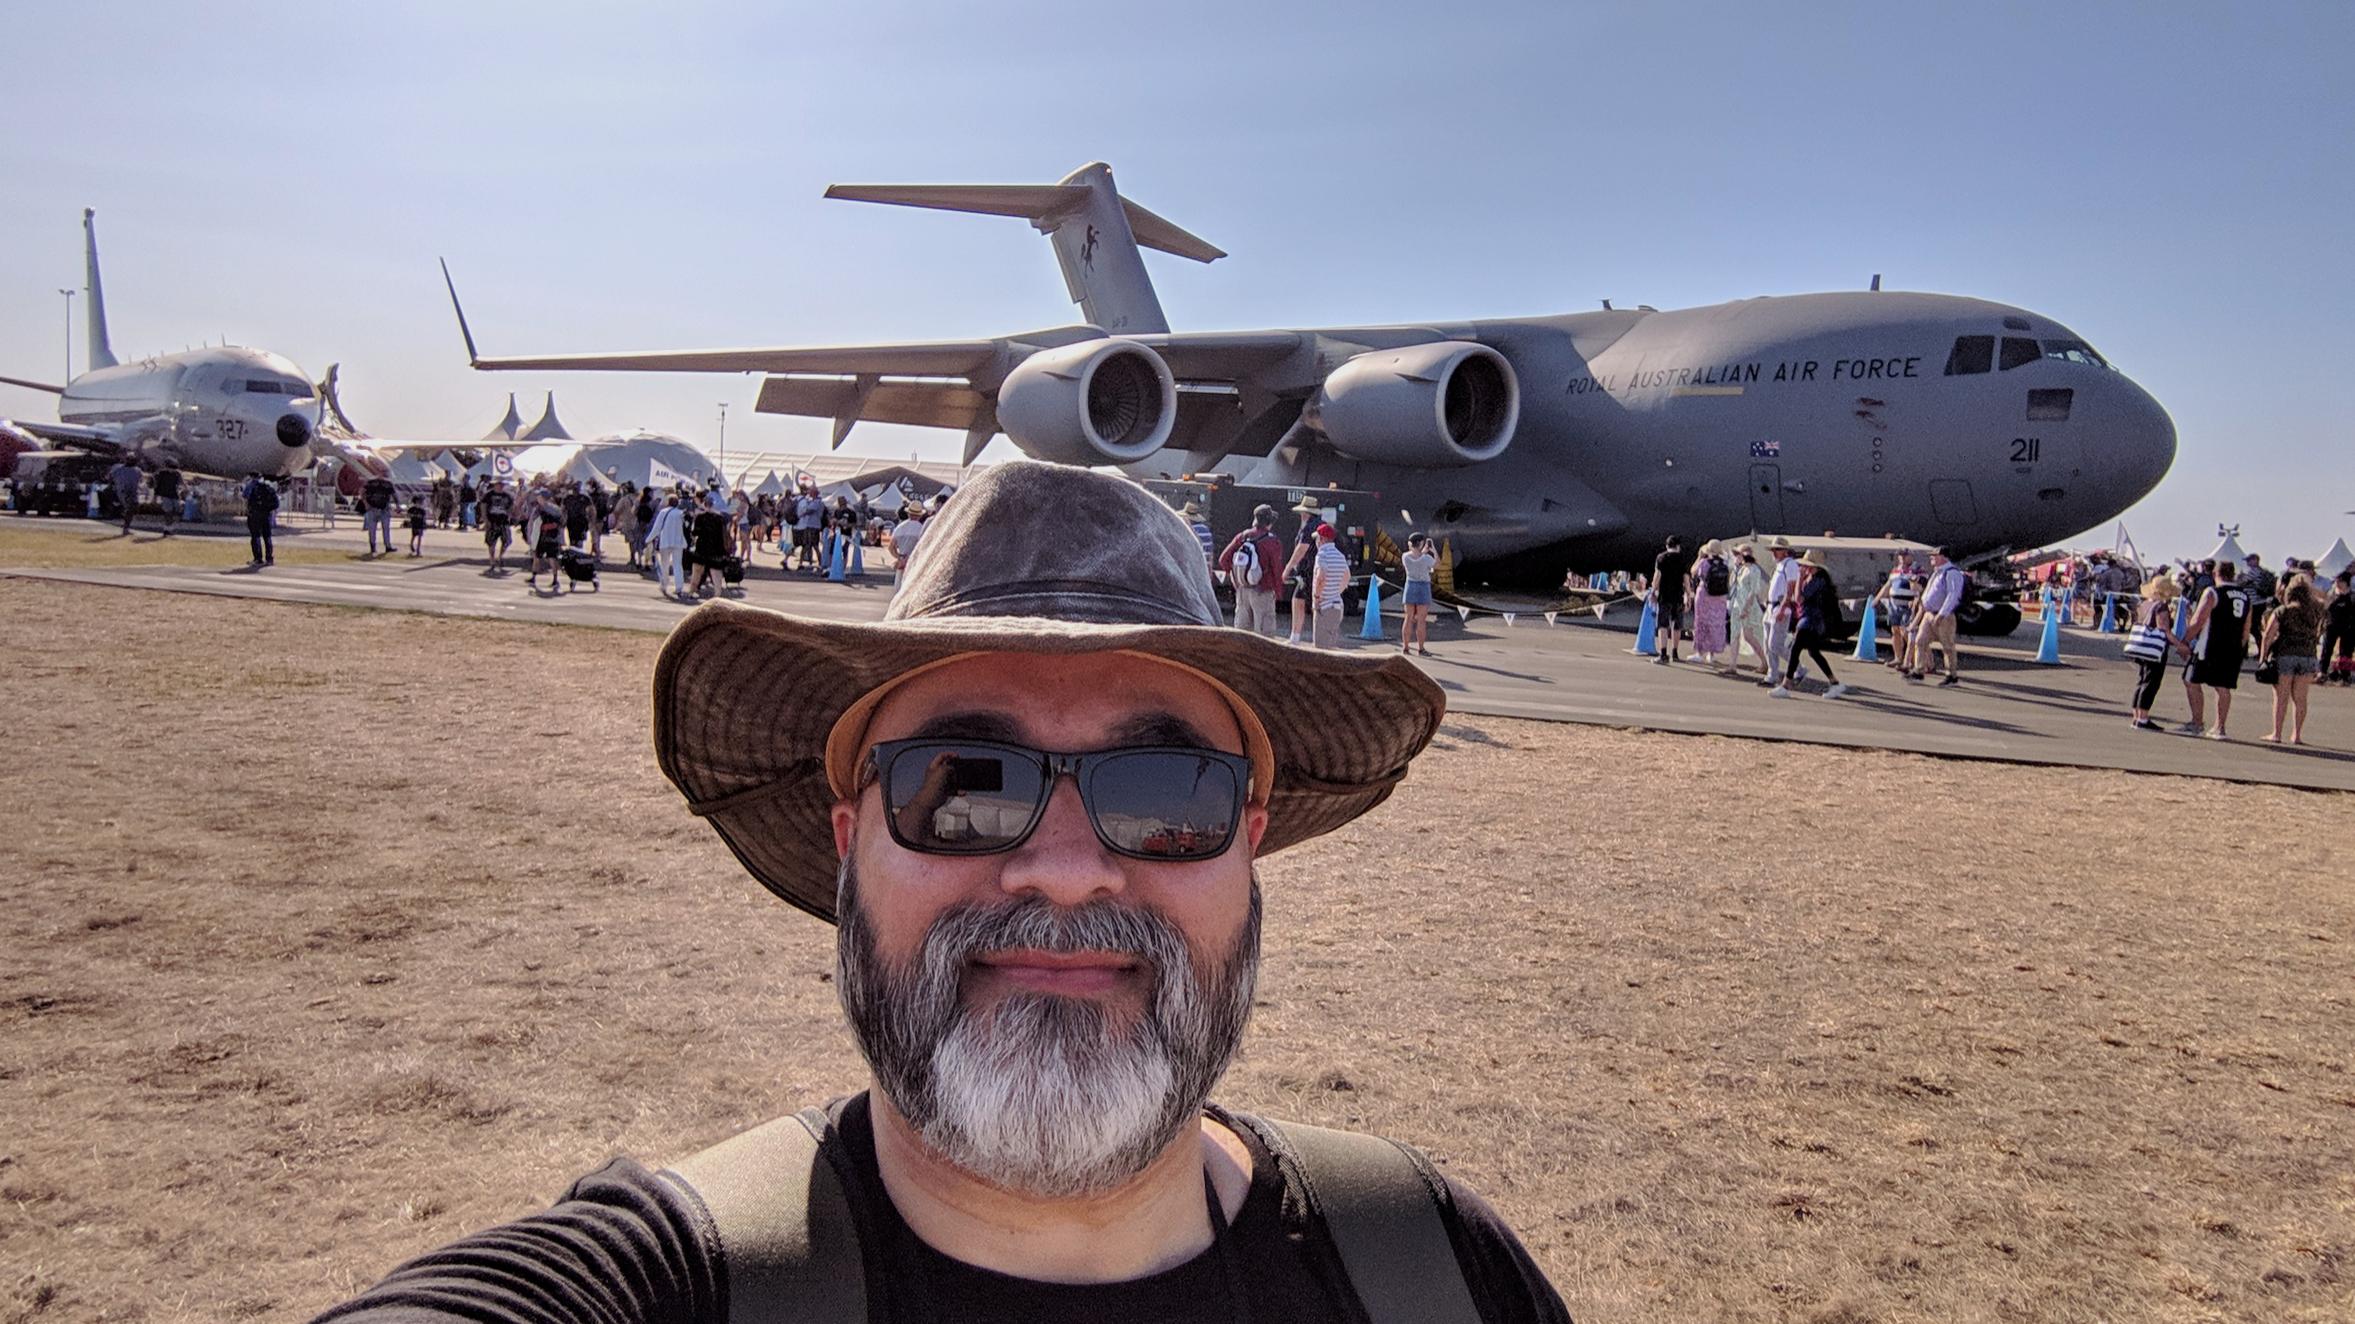 C-17 Globemaster III - selfie.jpg